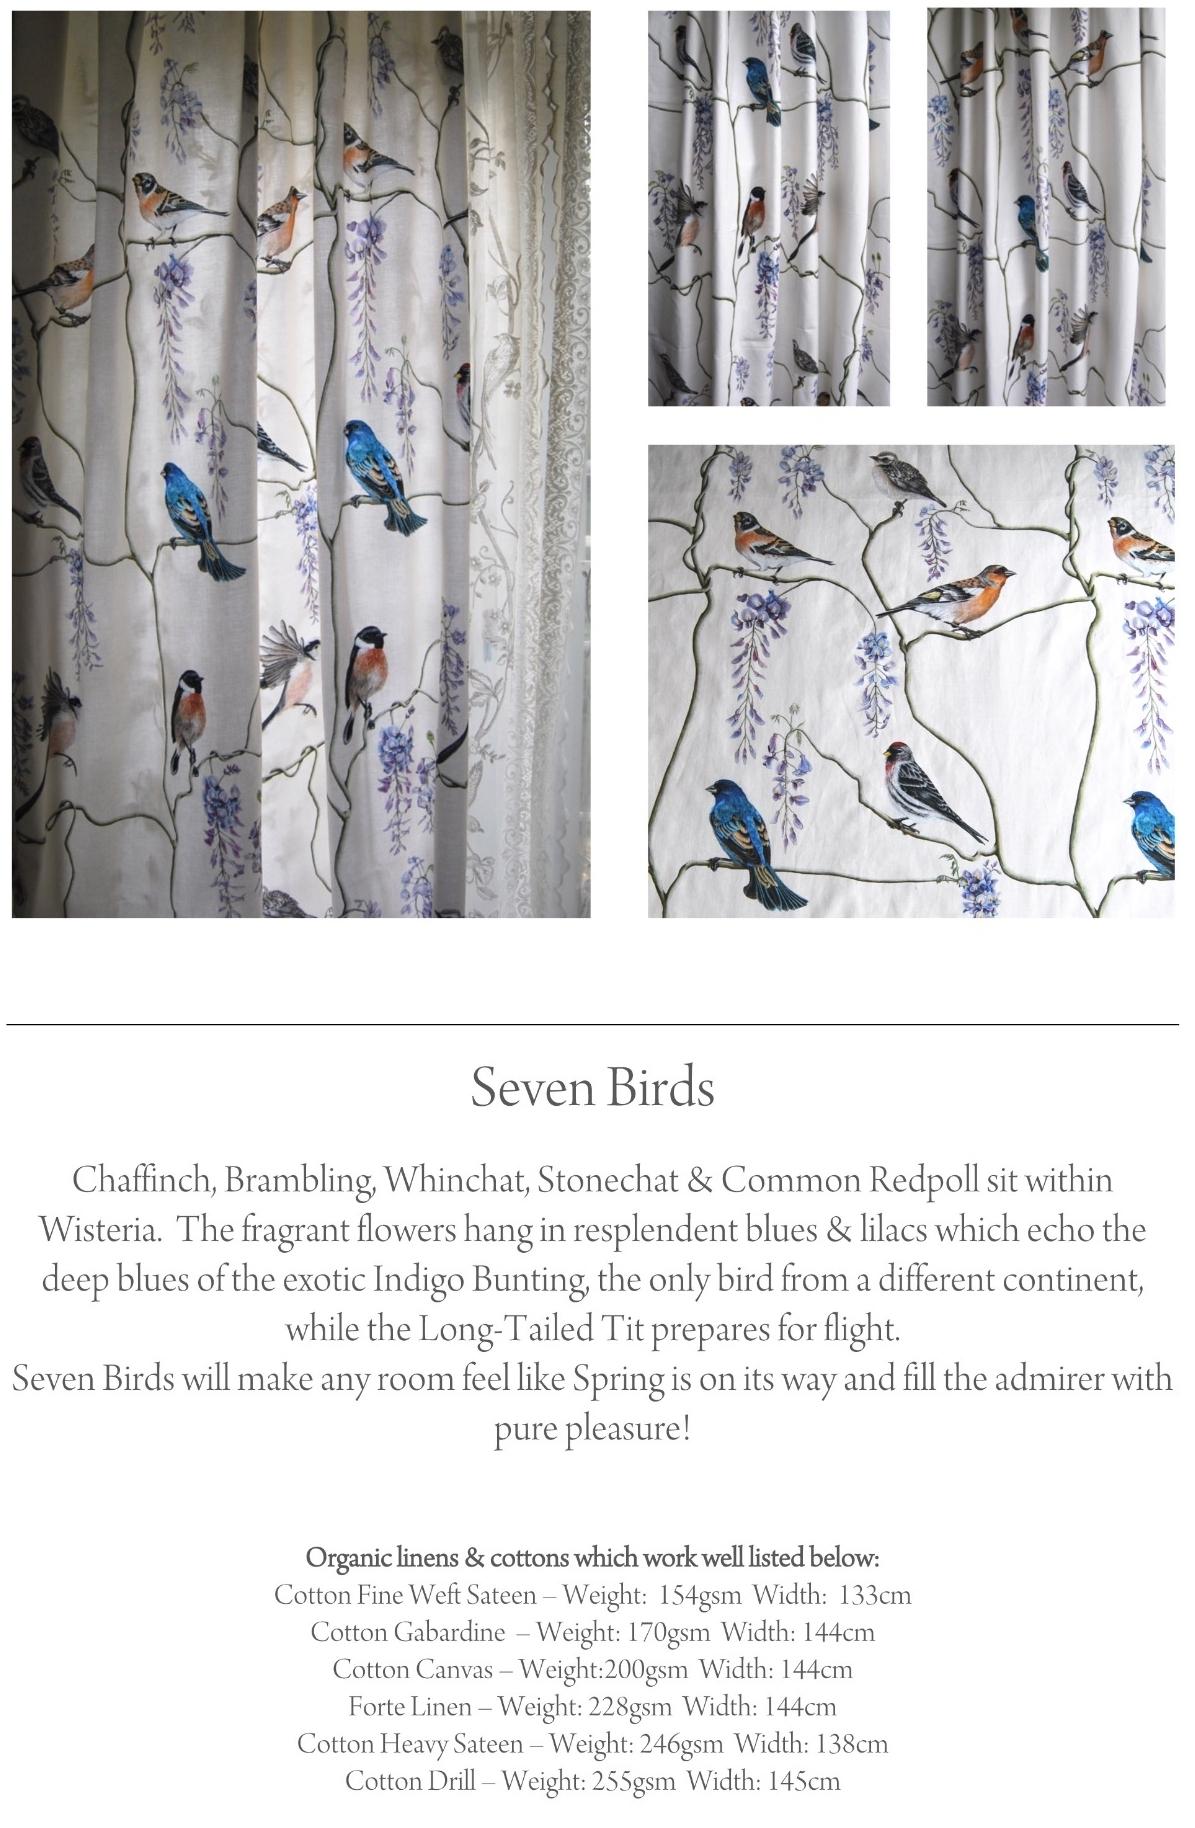 seven birds material